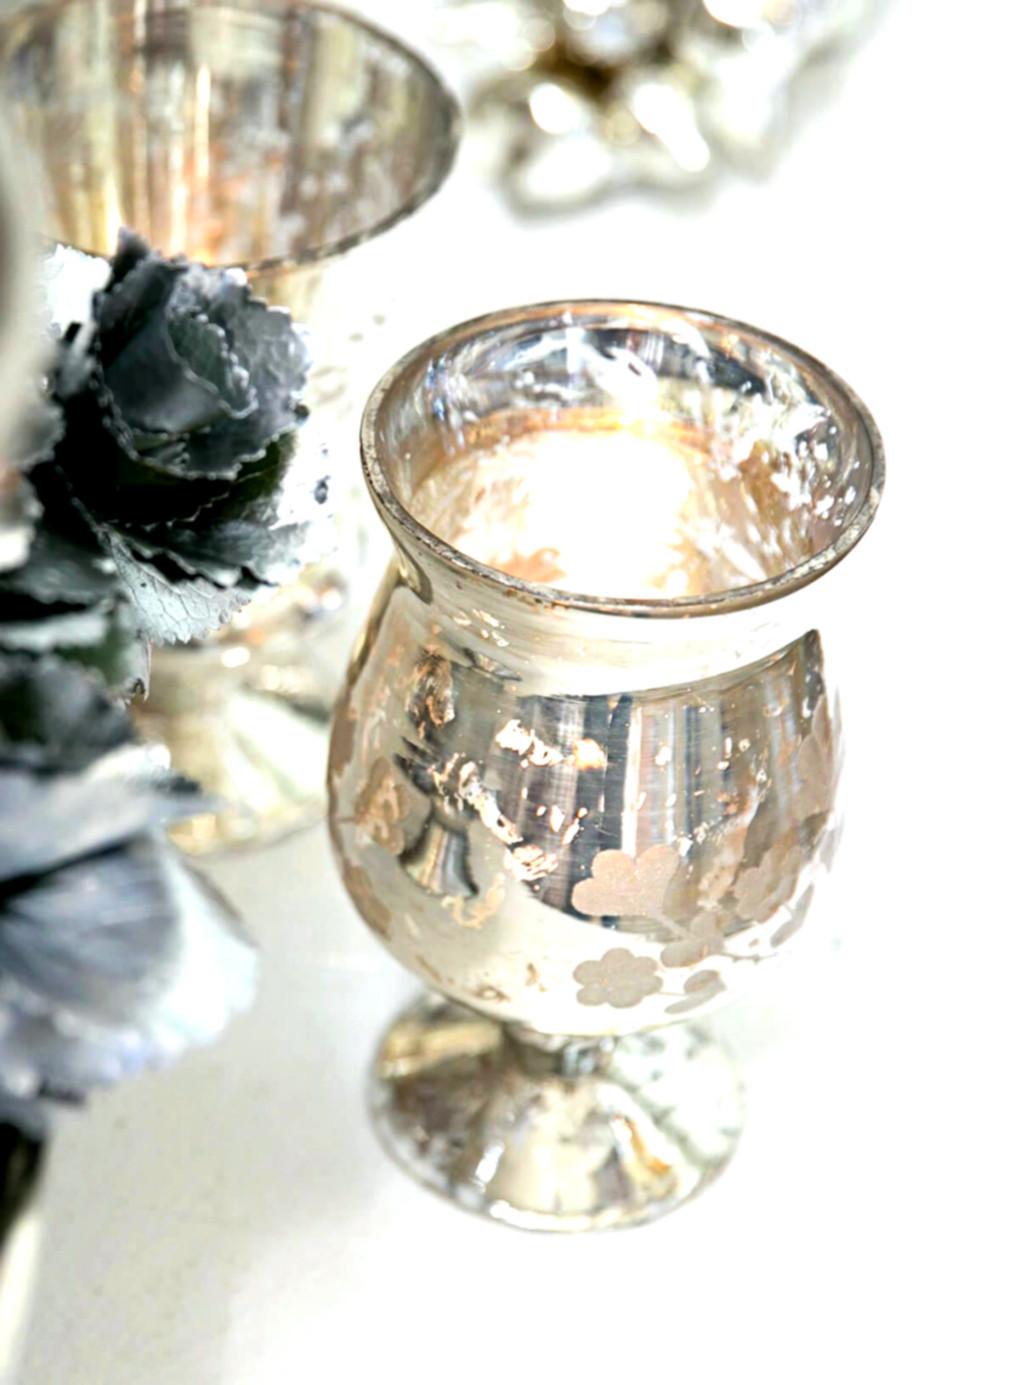 15 Stylish Silver Pedestal Vase 2021 free download silver pedestal vase of glass vases large clear glass vases 26 7 8e280b3 tall clear fluted in large clear glass vases 26 7 8e280b3 tall clear fluted pictures 1